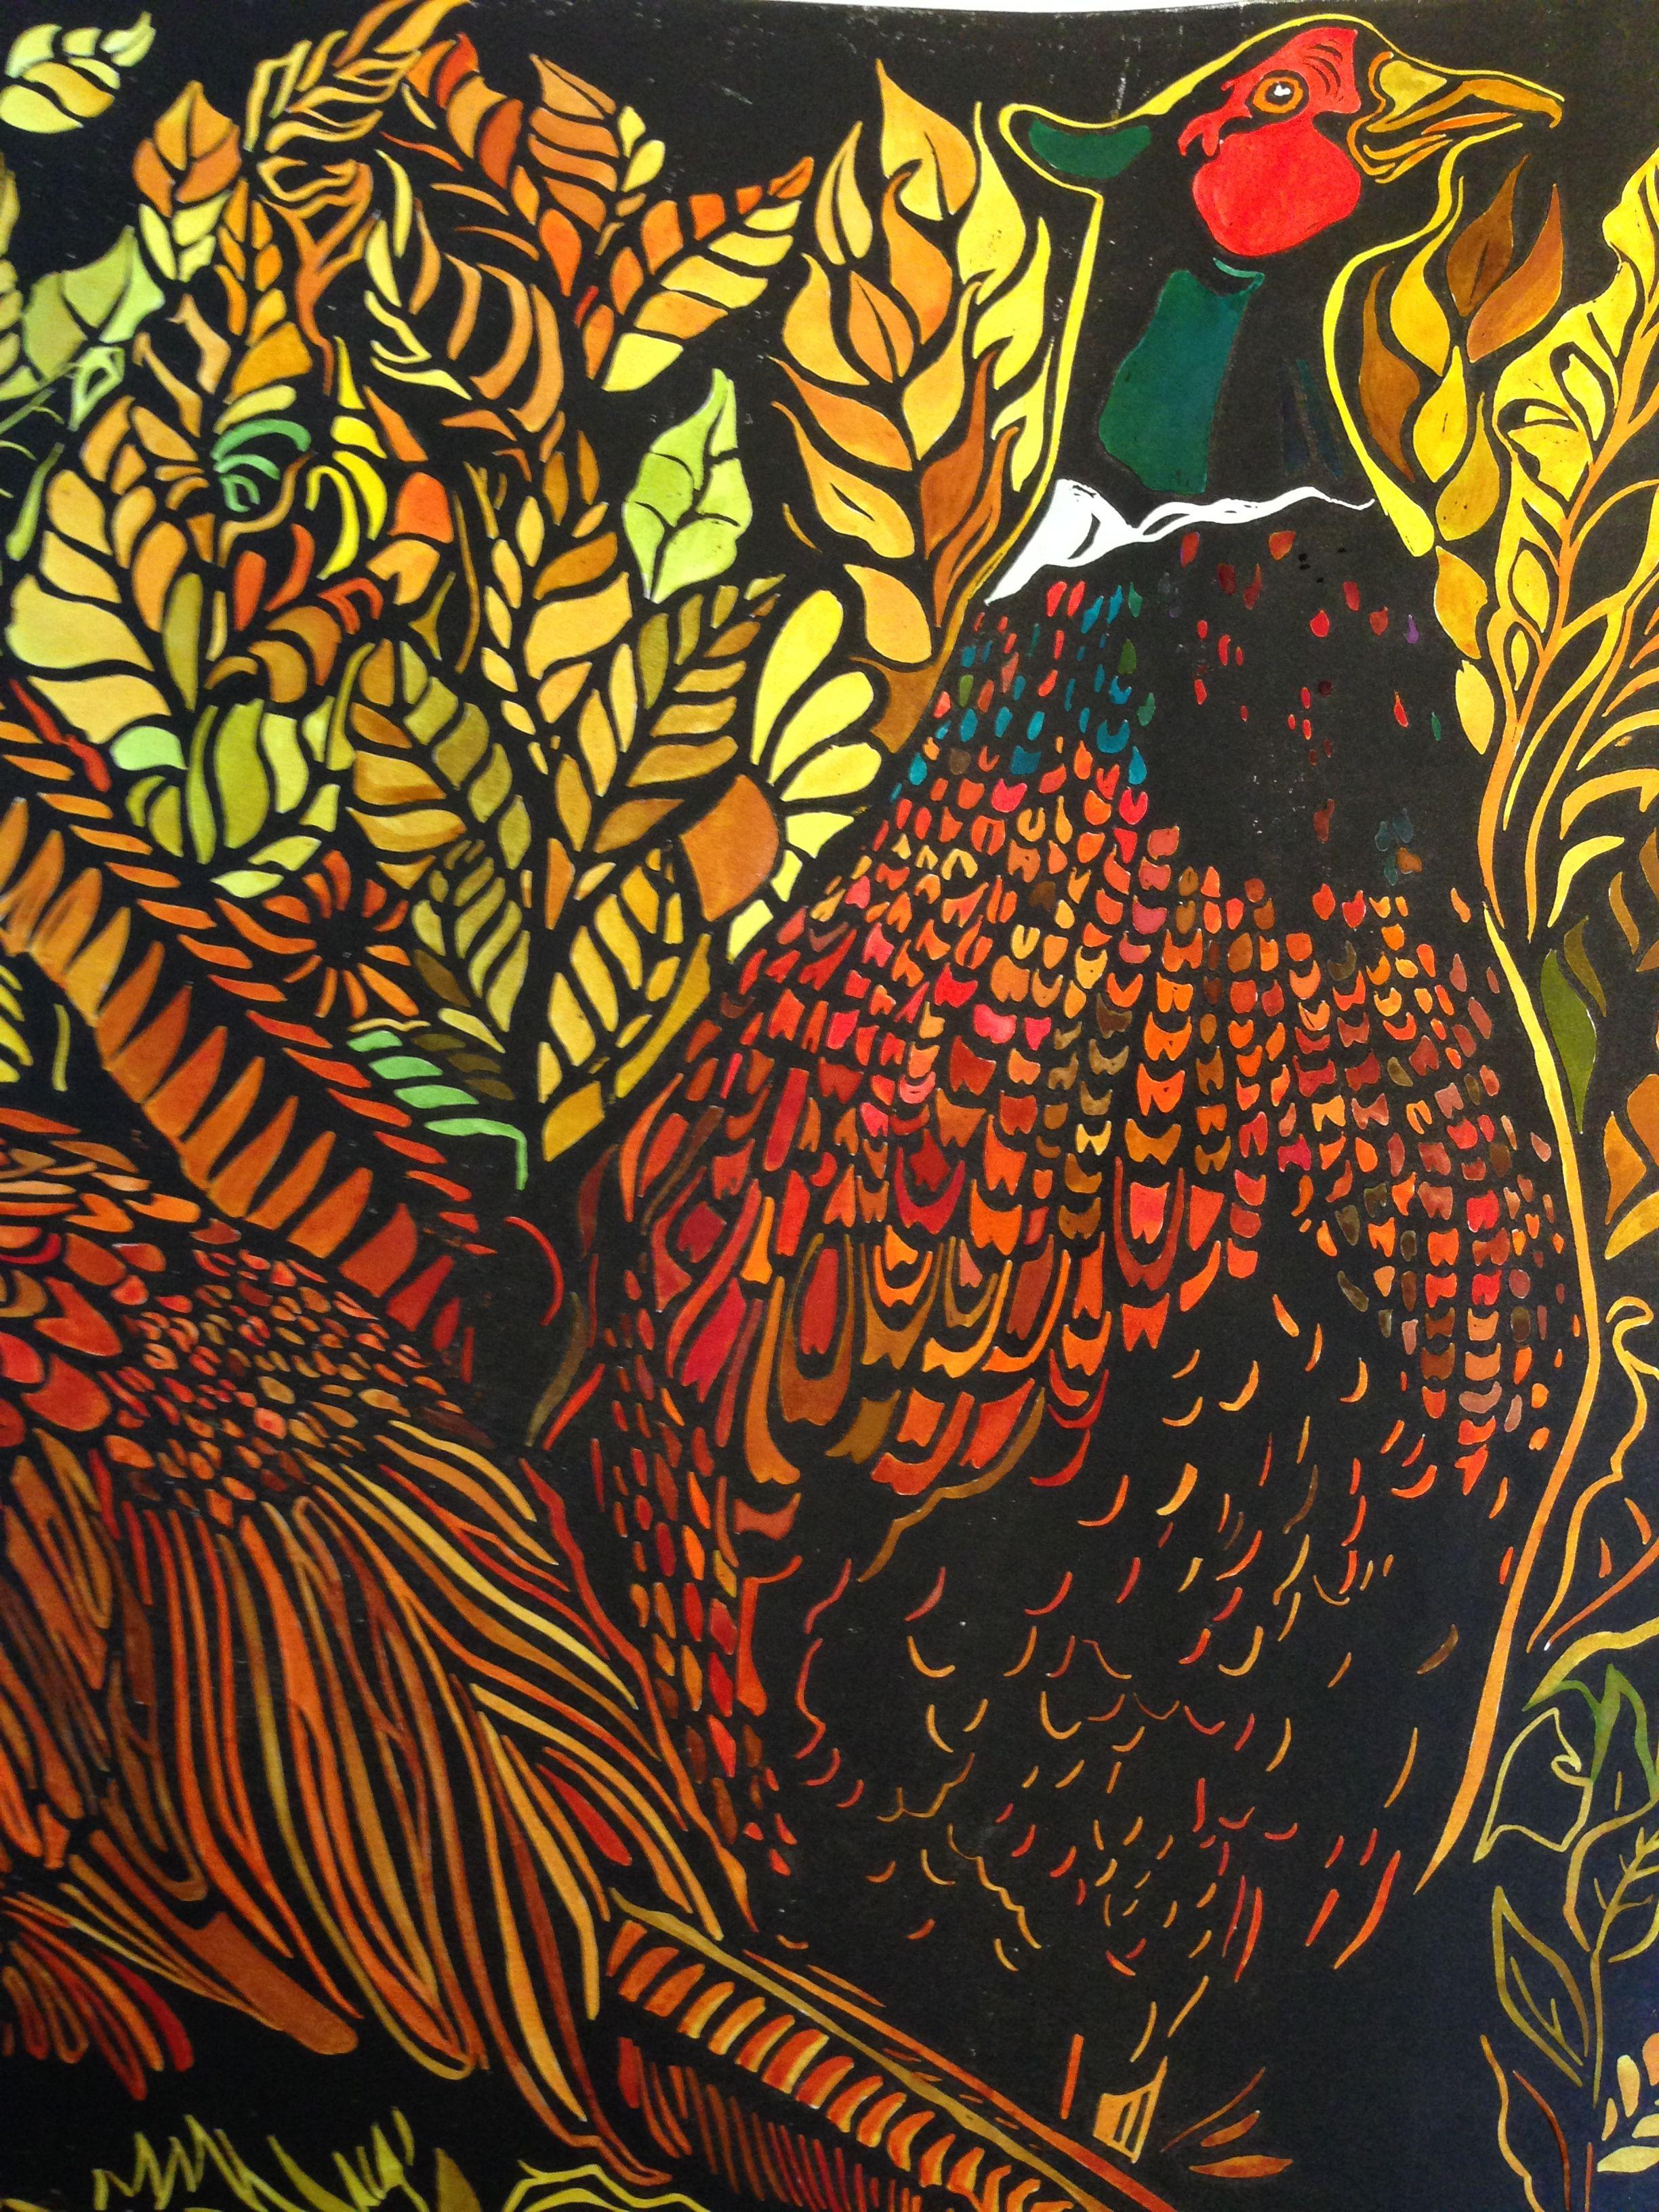 pheasant hand painted lino print artist cara ayers